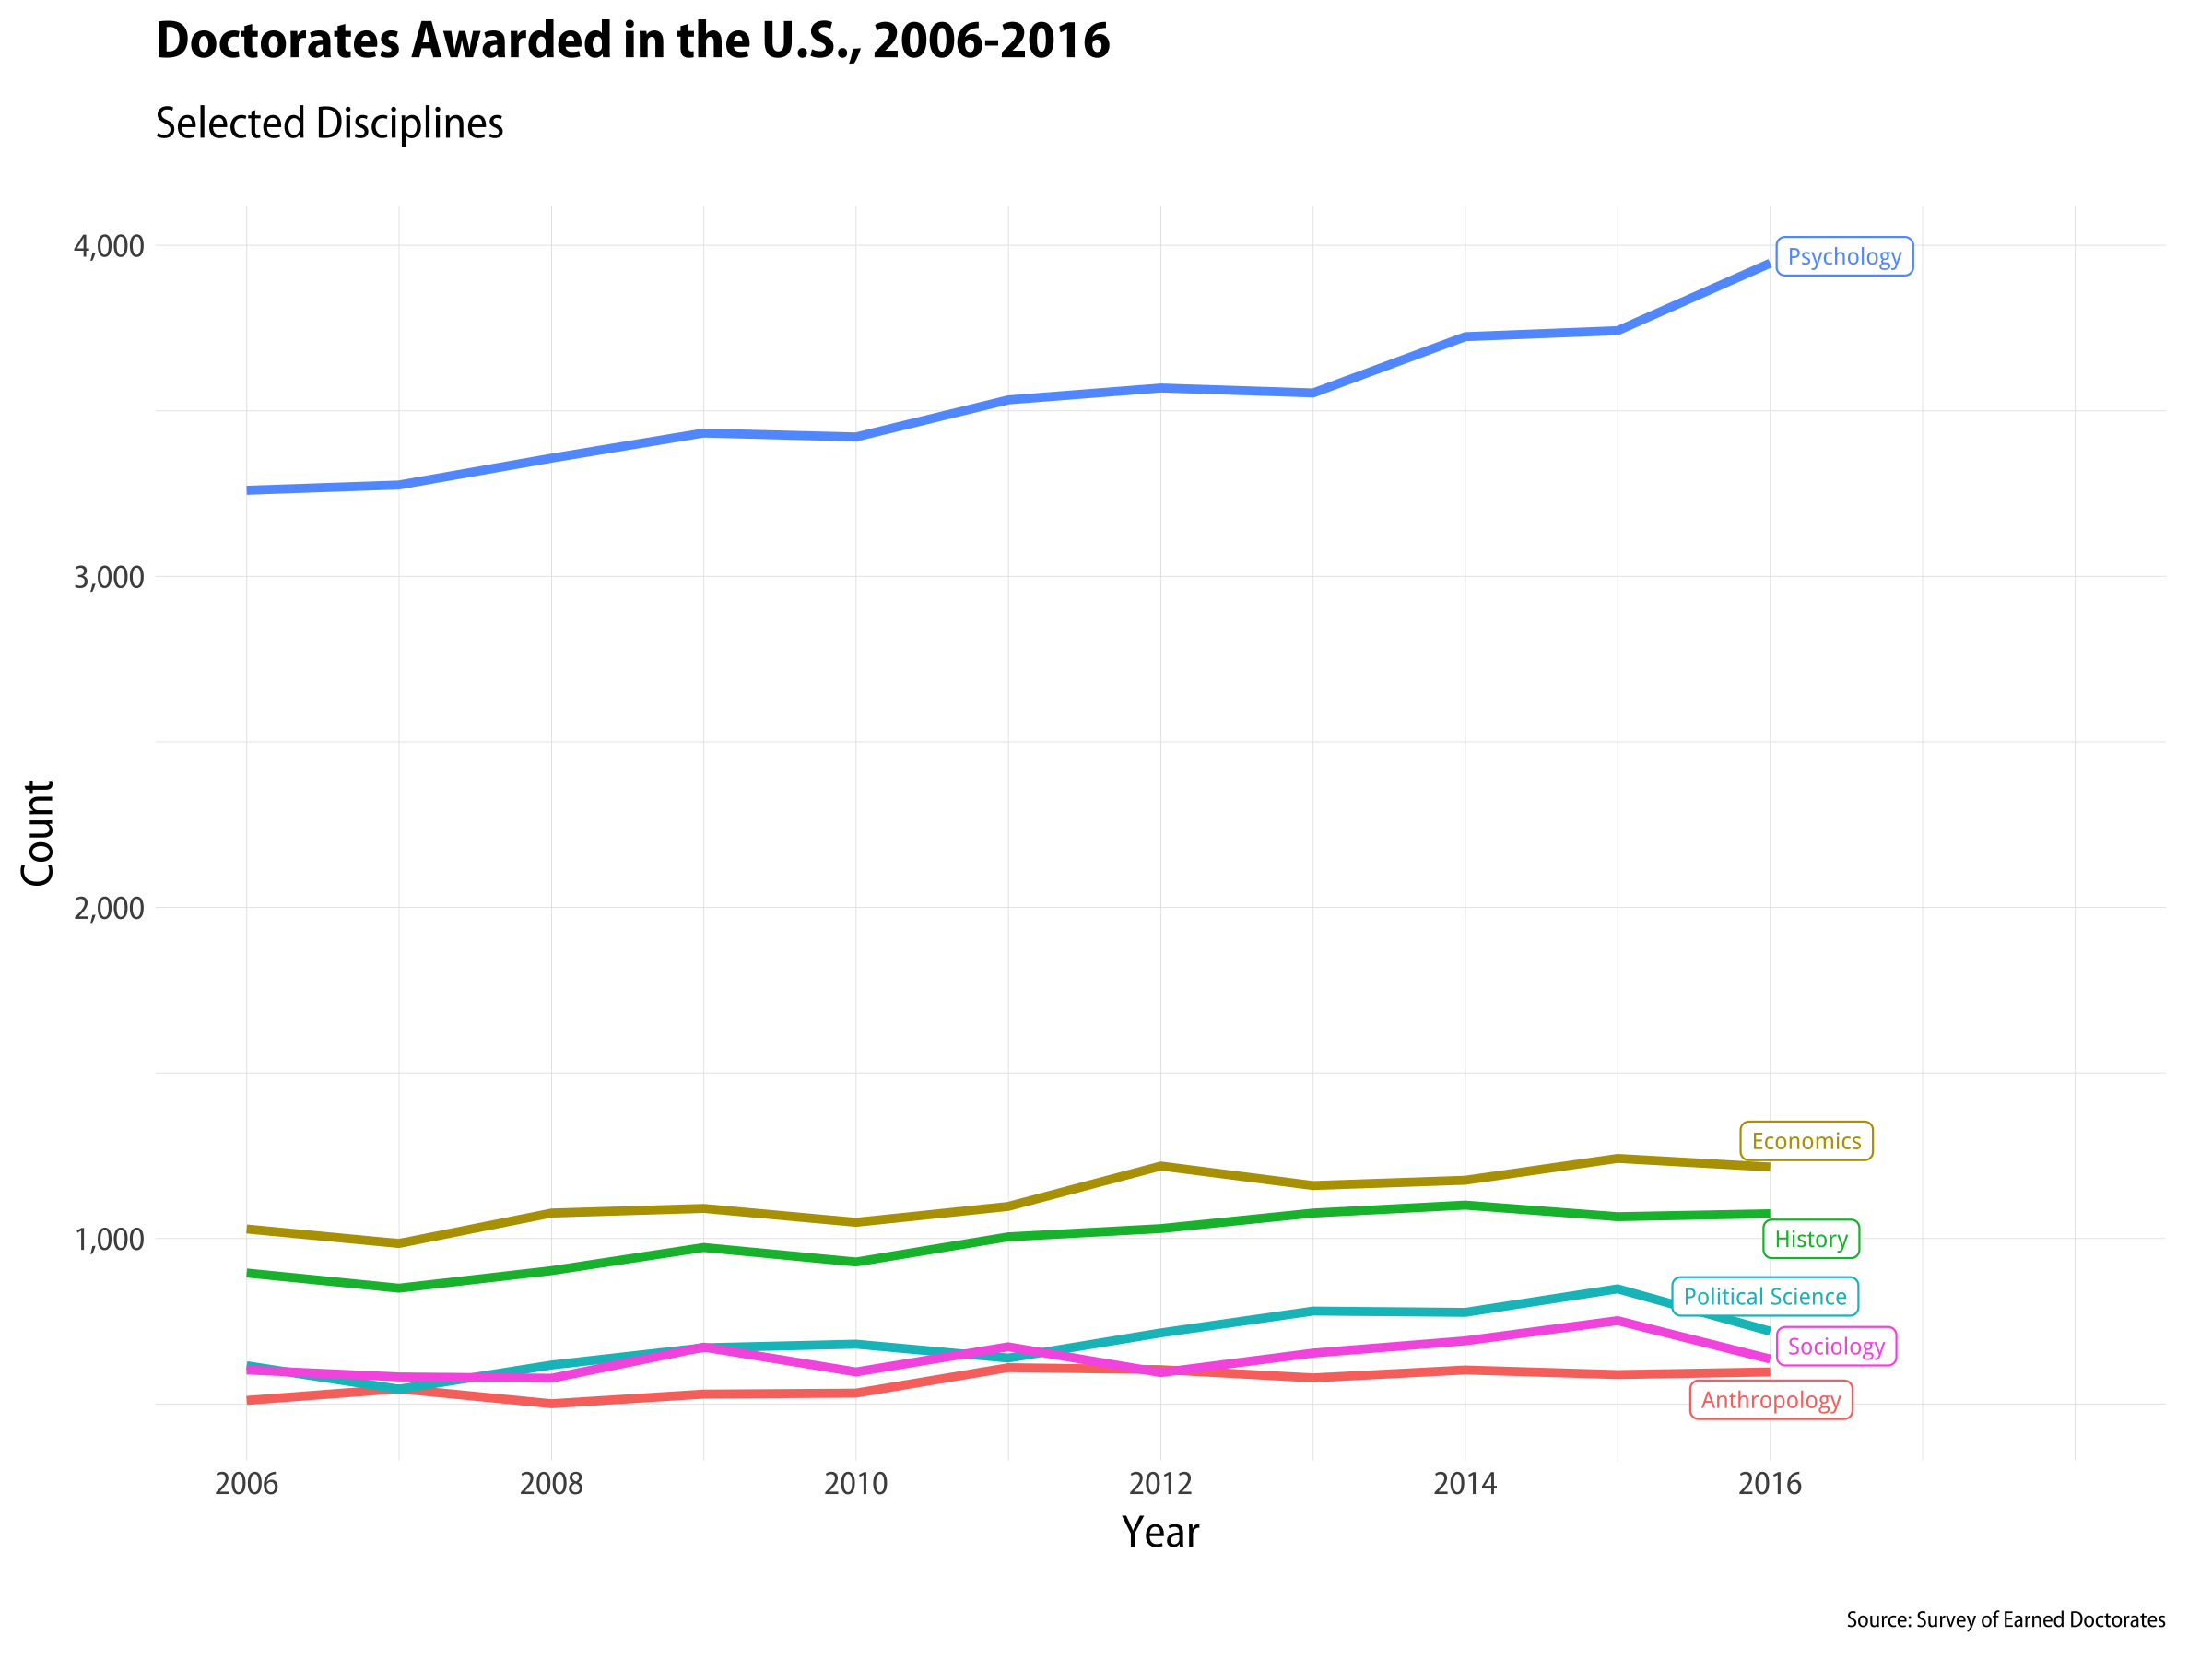 Trend plot